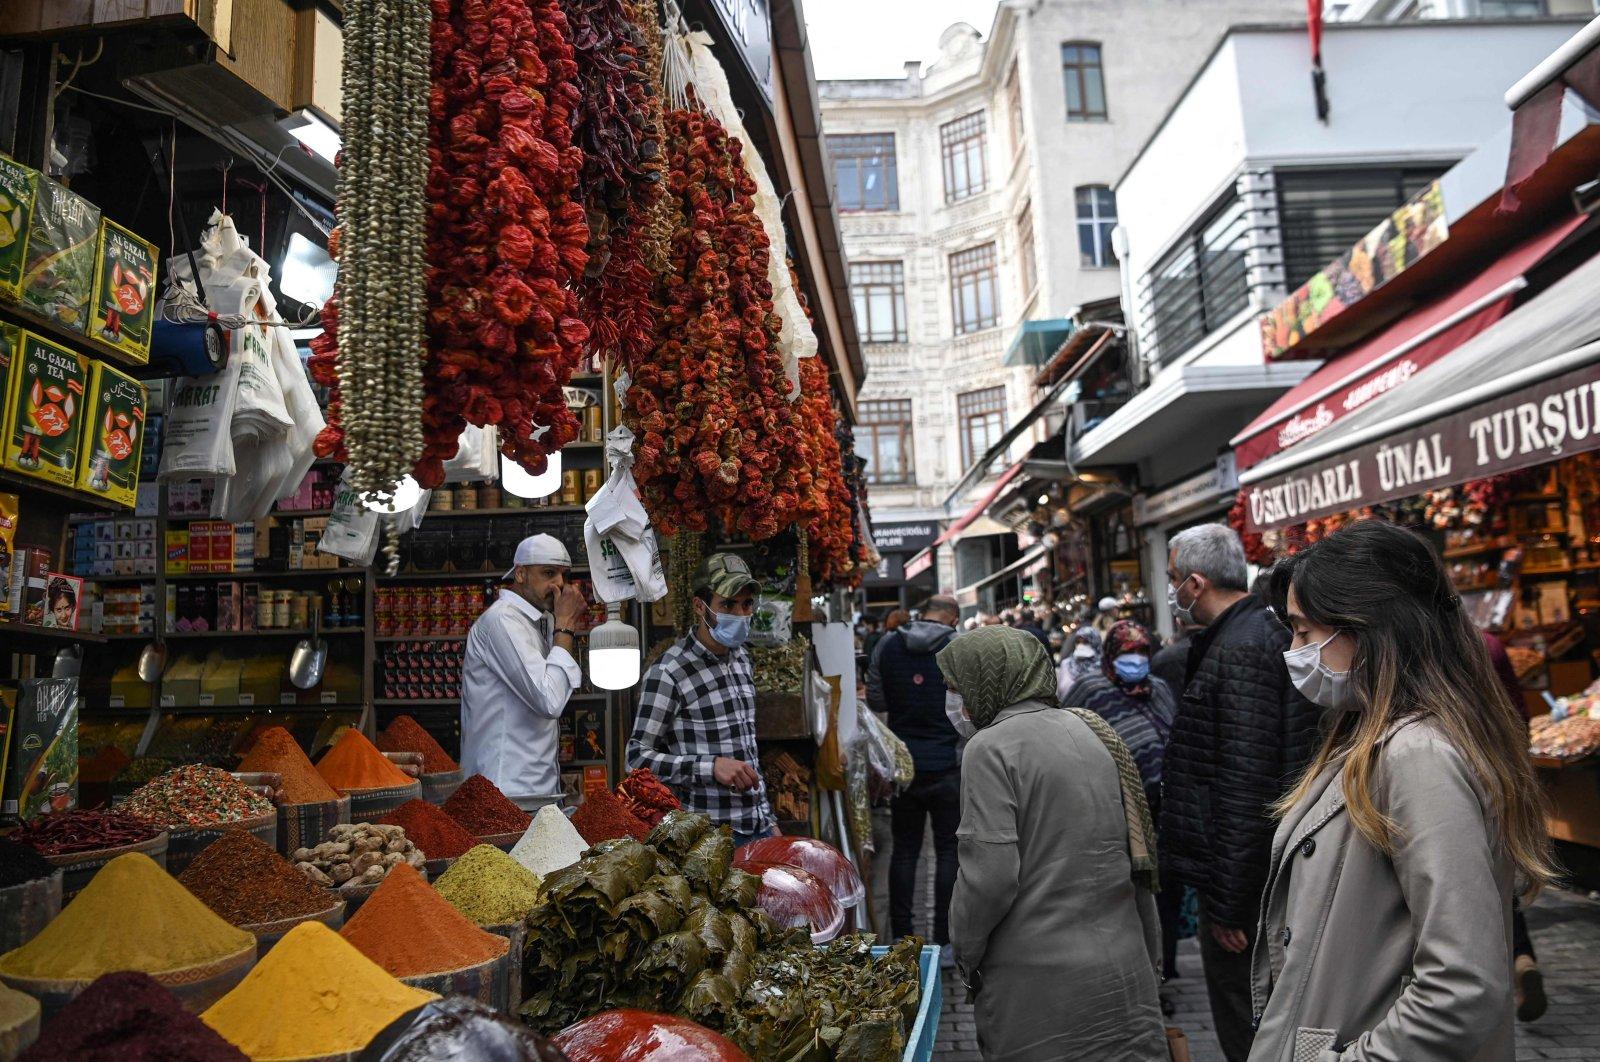 People shop near the Spice Bazaar in the Eminönü neighborhood on the European side of Istanbul, Turkey, April 27, 2021. (AFP Photo)